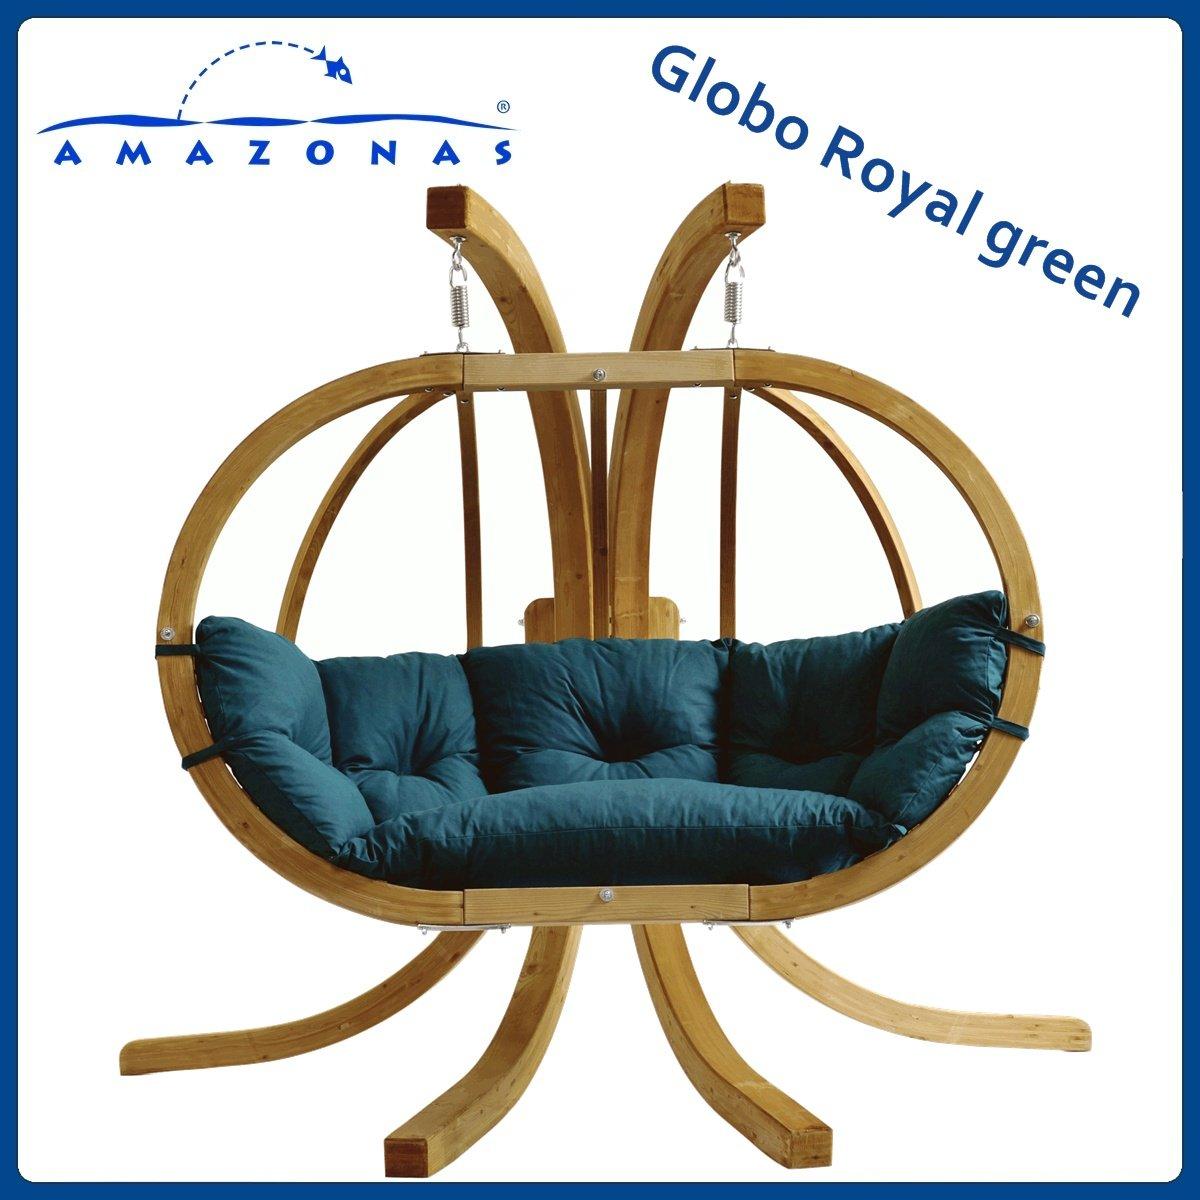 Balancelle GLOBO ROYAL Vert avec support kaufen